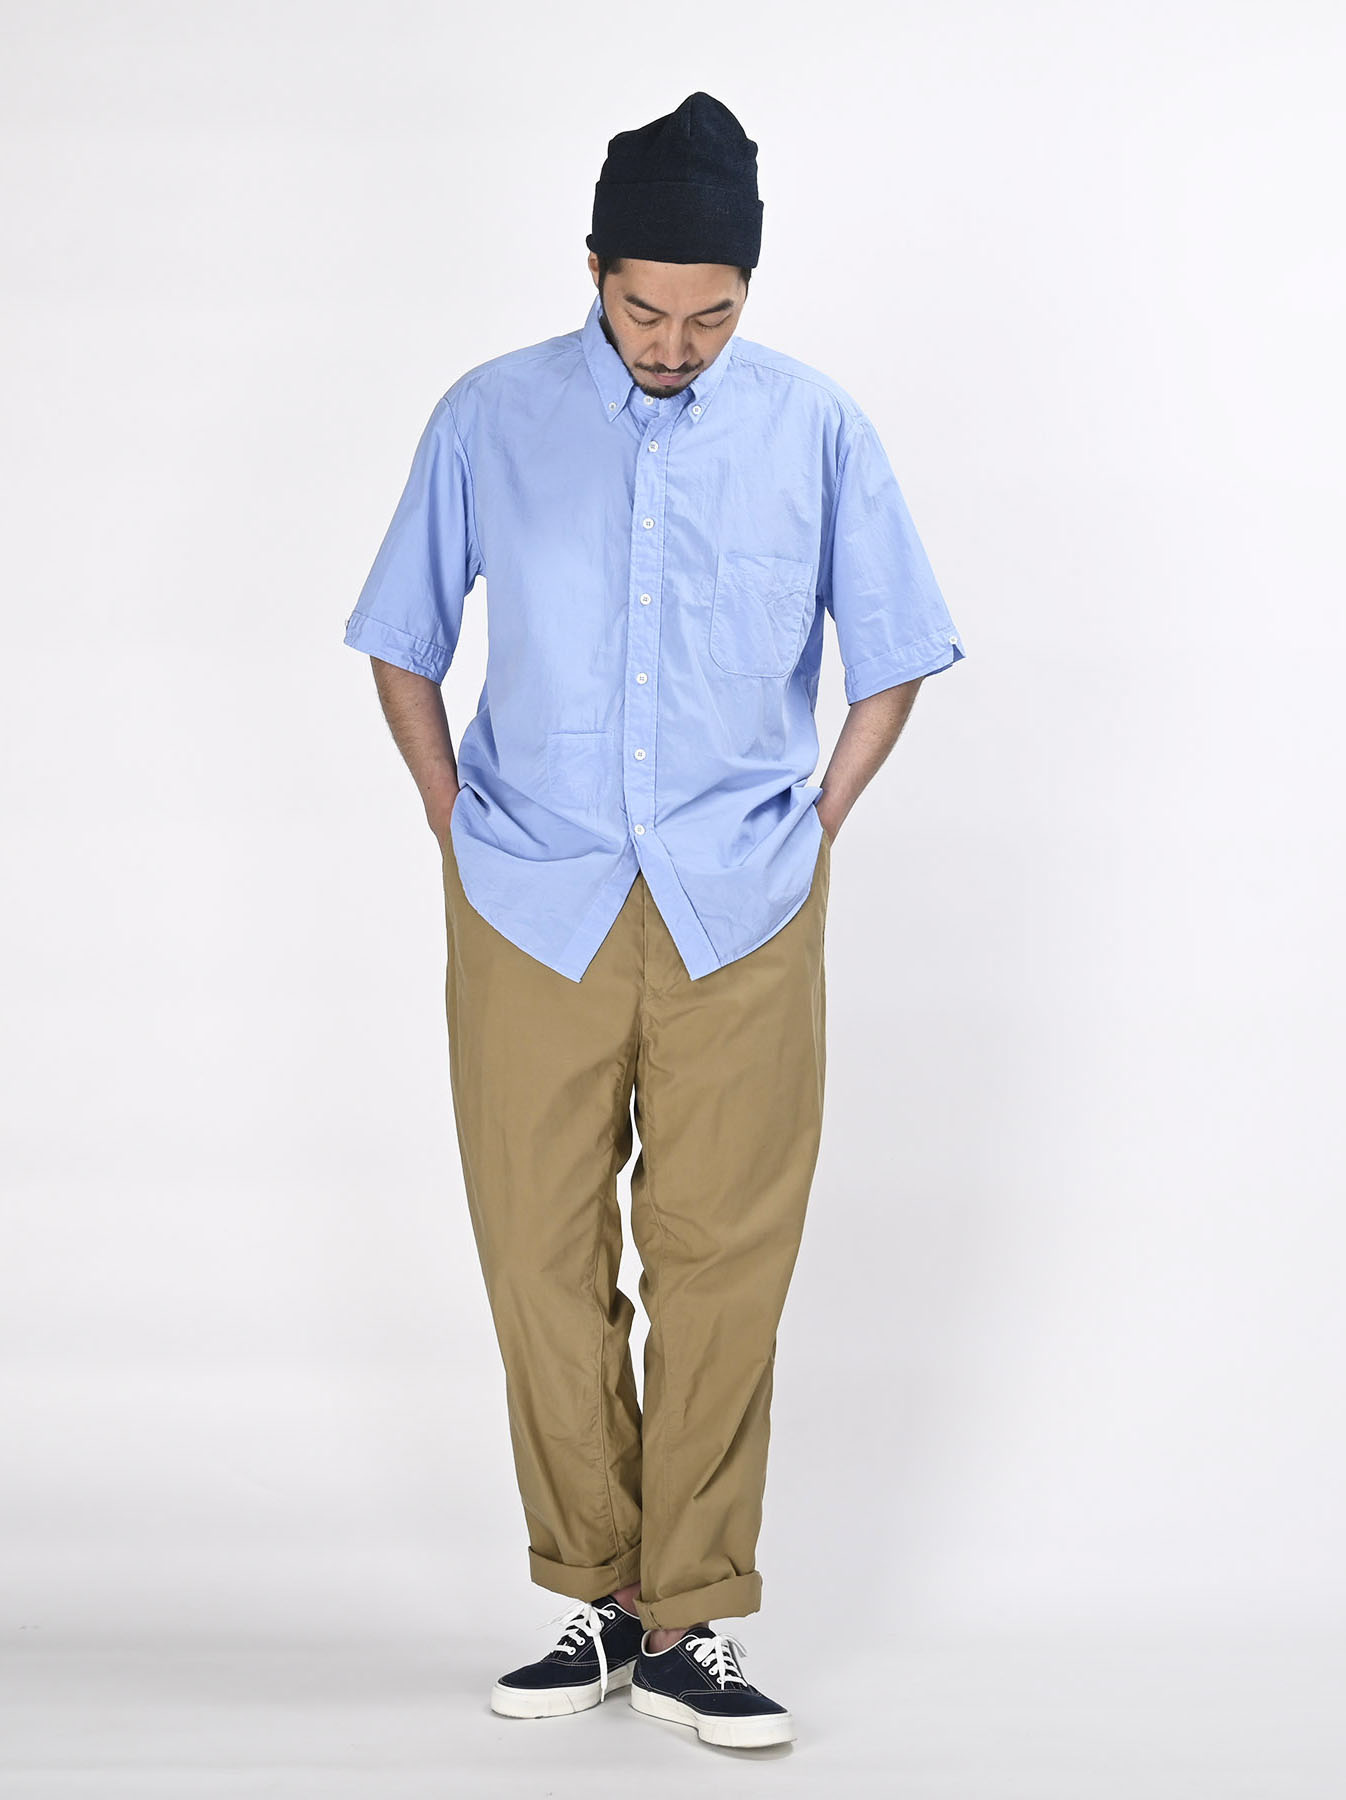 Damp Cotton Anuenue Ocean Shirt (0621)-8